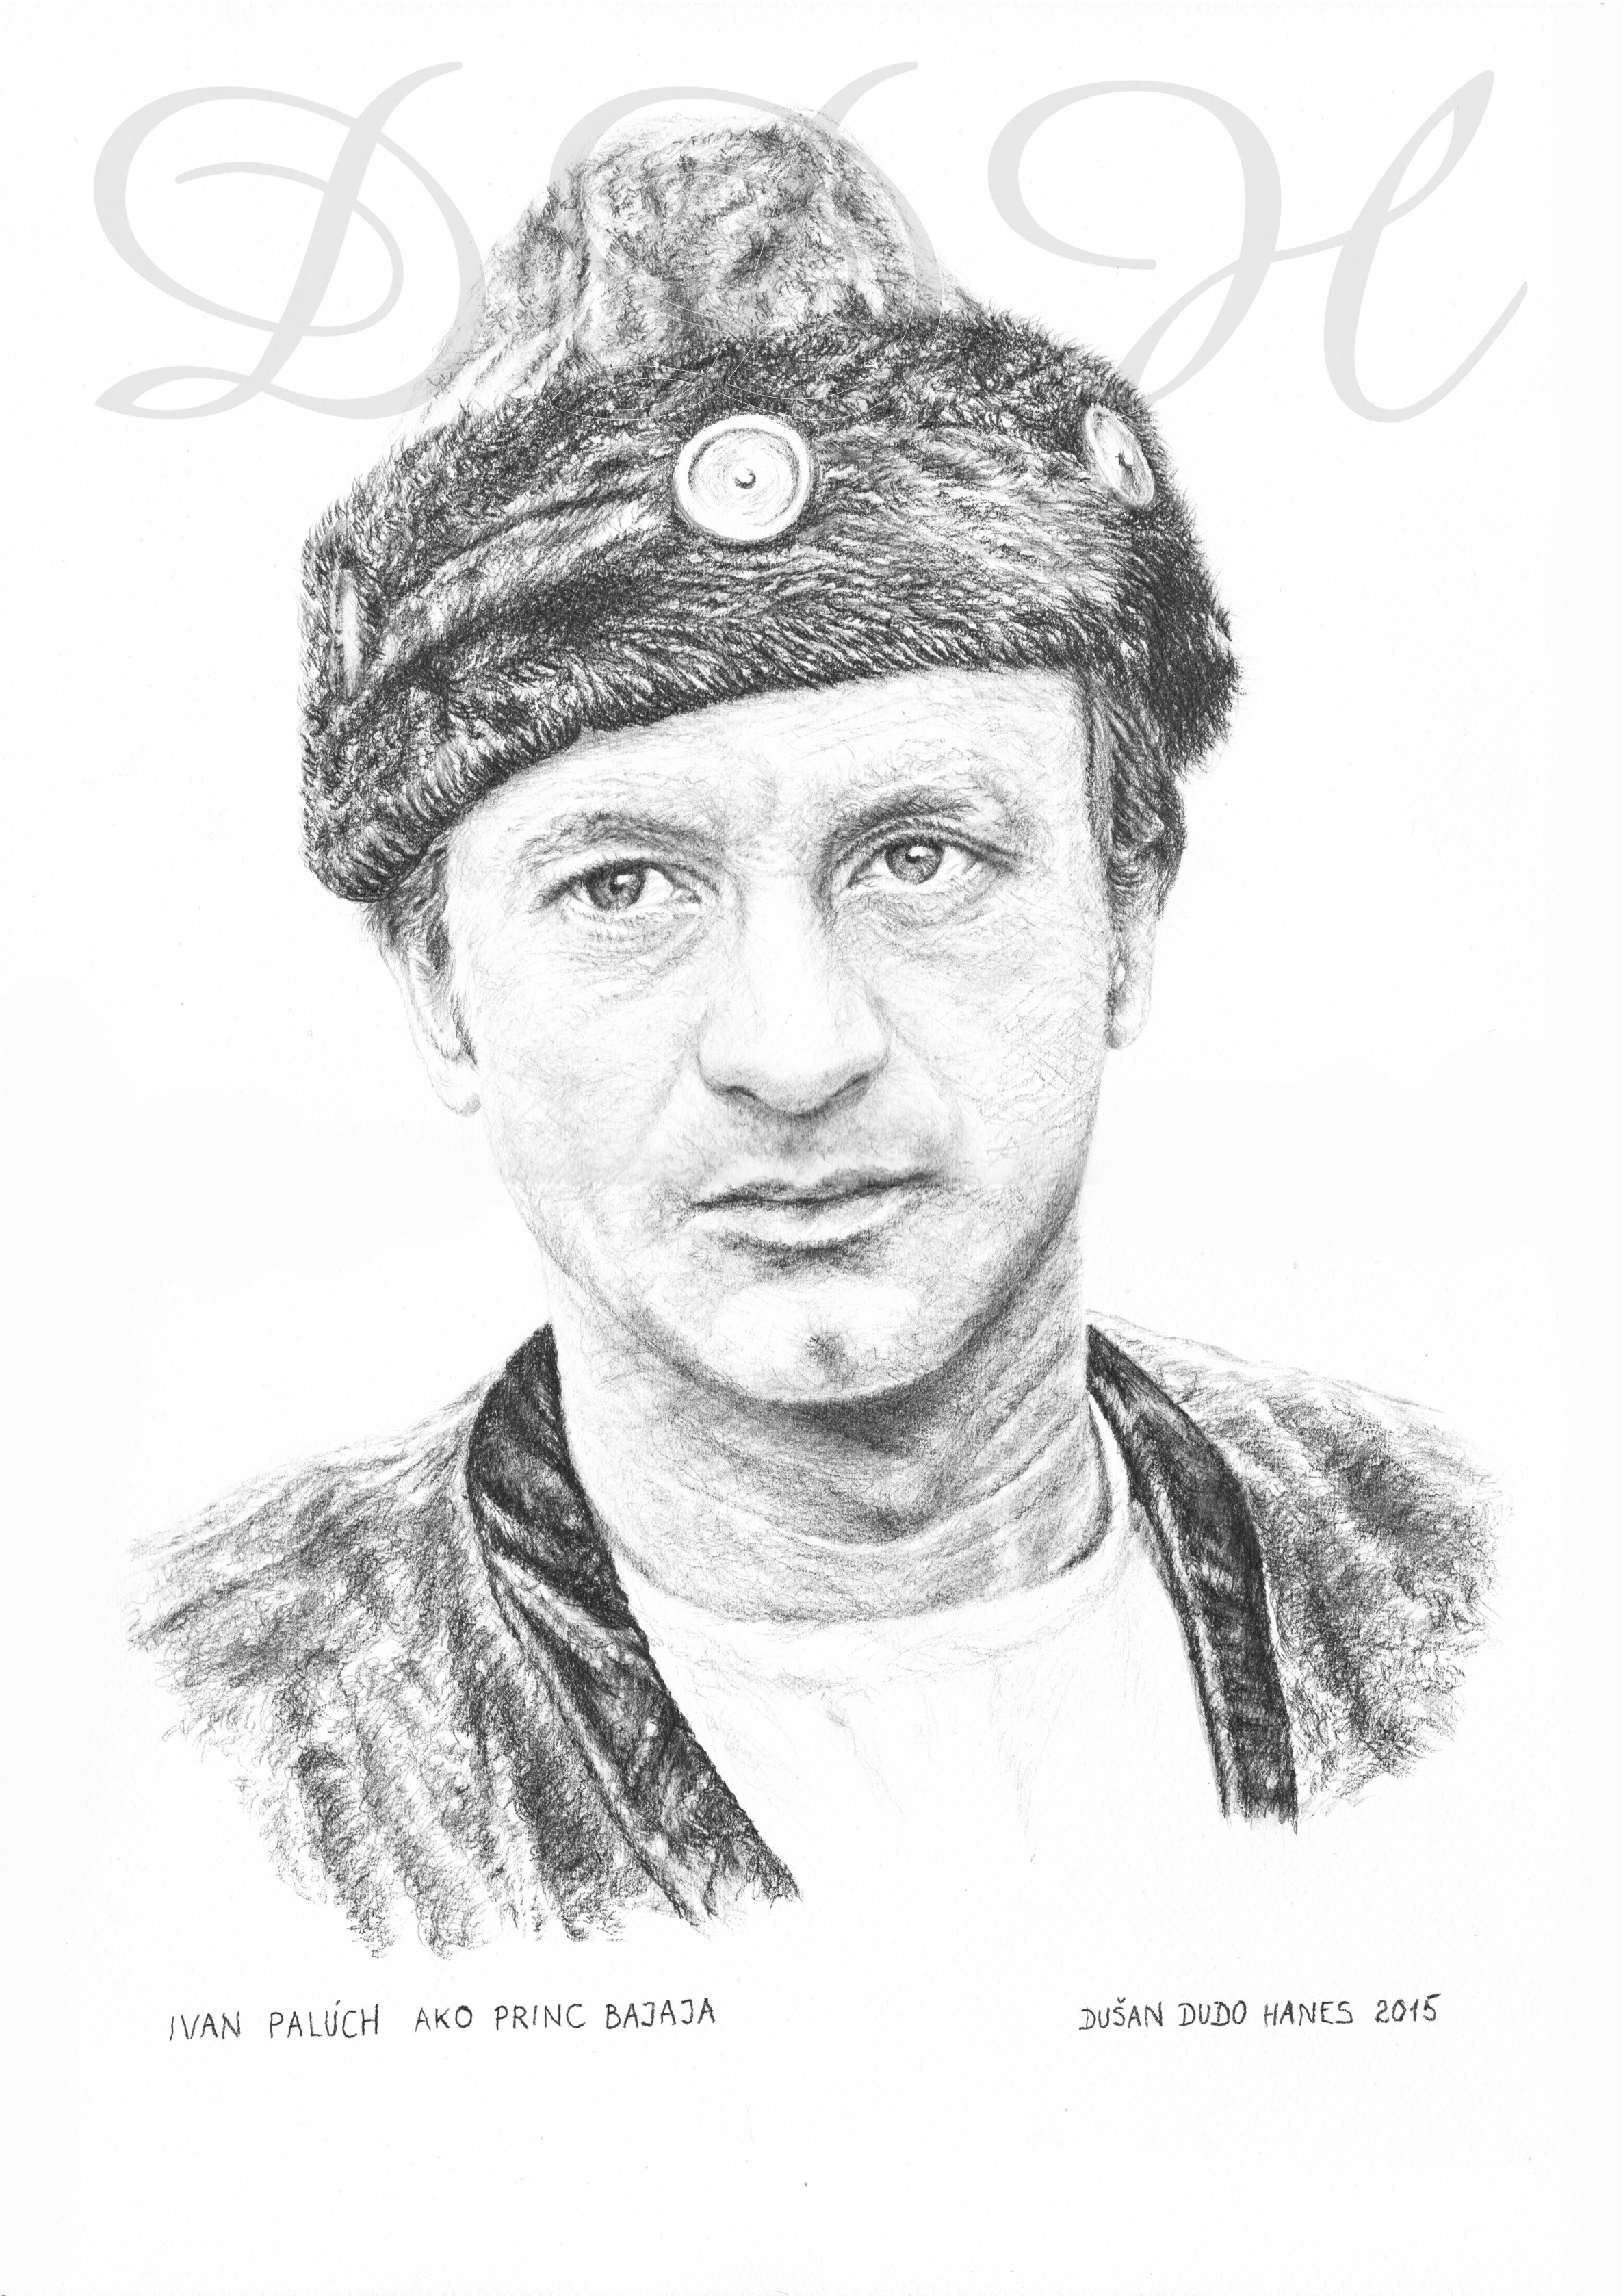 131 - Ivan Palúch, portrét Dušan Dudo Hanes